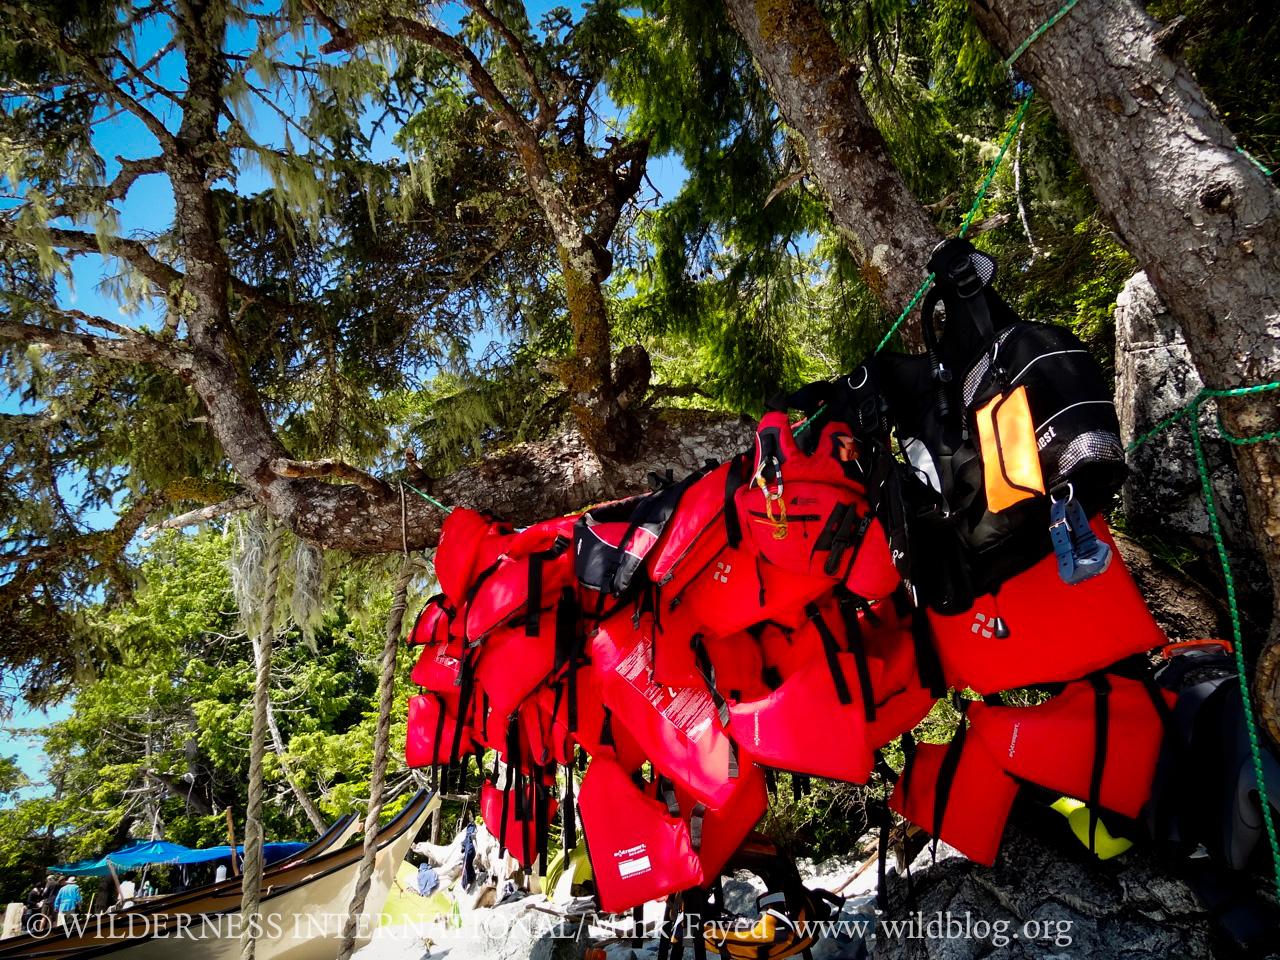 http://wi.wildblog.org/wp-content/uploads/2012/07/lr-08868.jpg